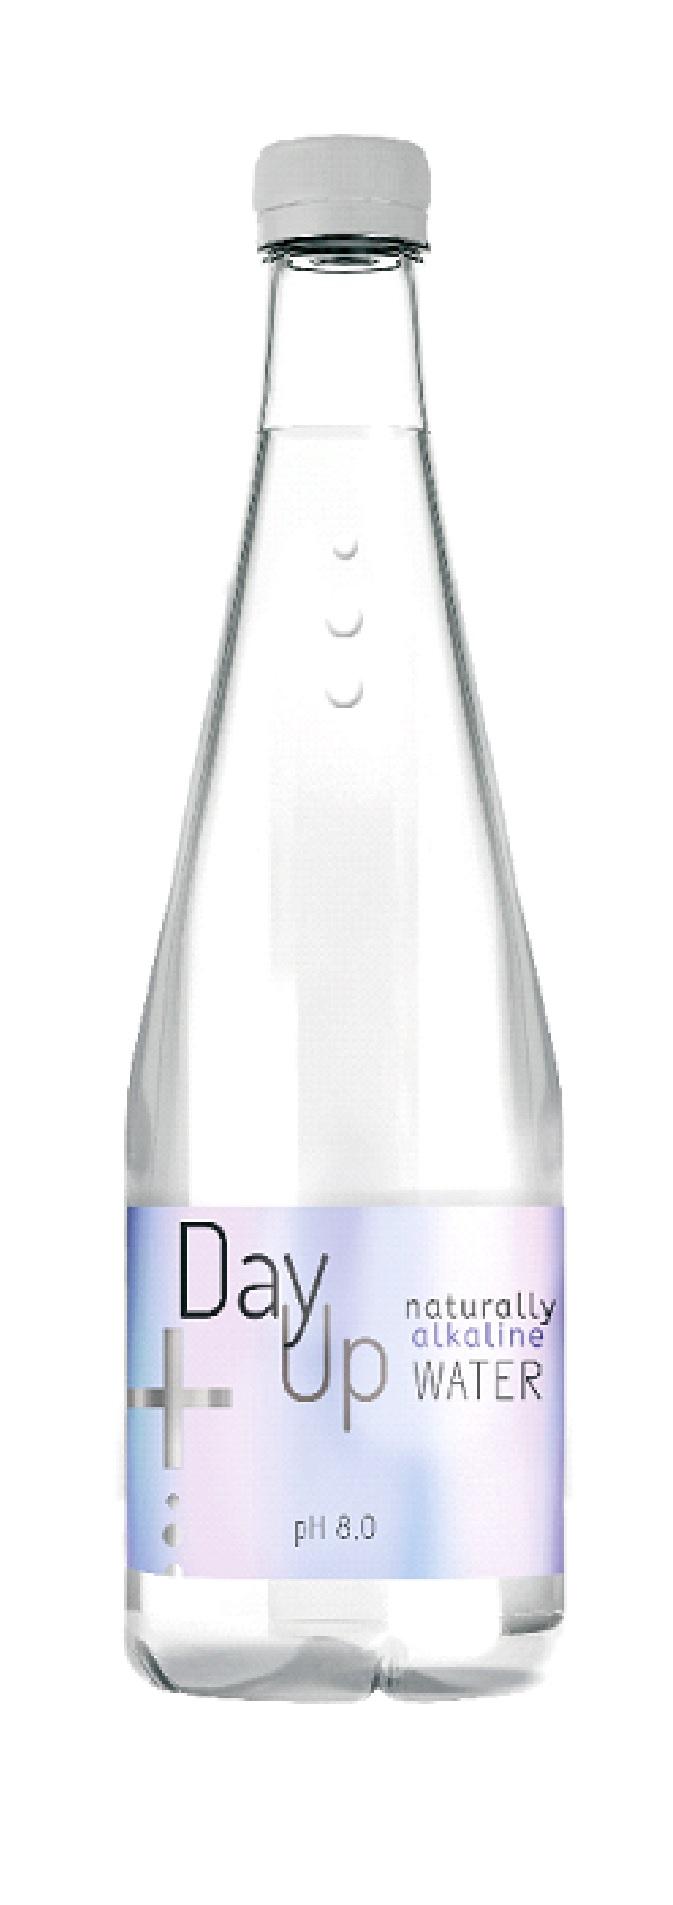 DayUp Naturally Alkaline Water